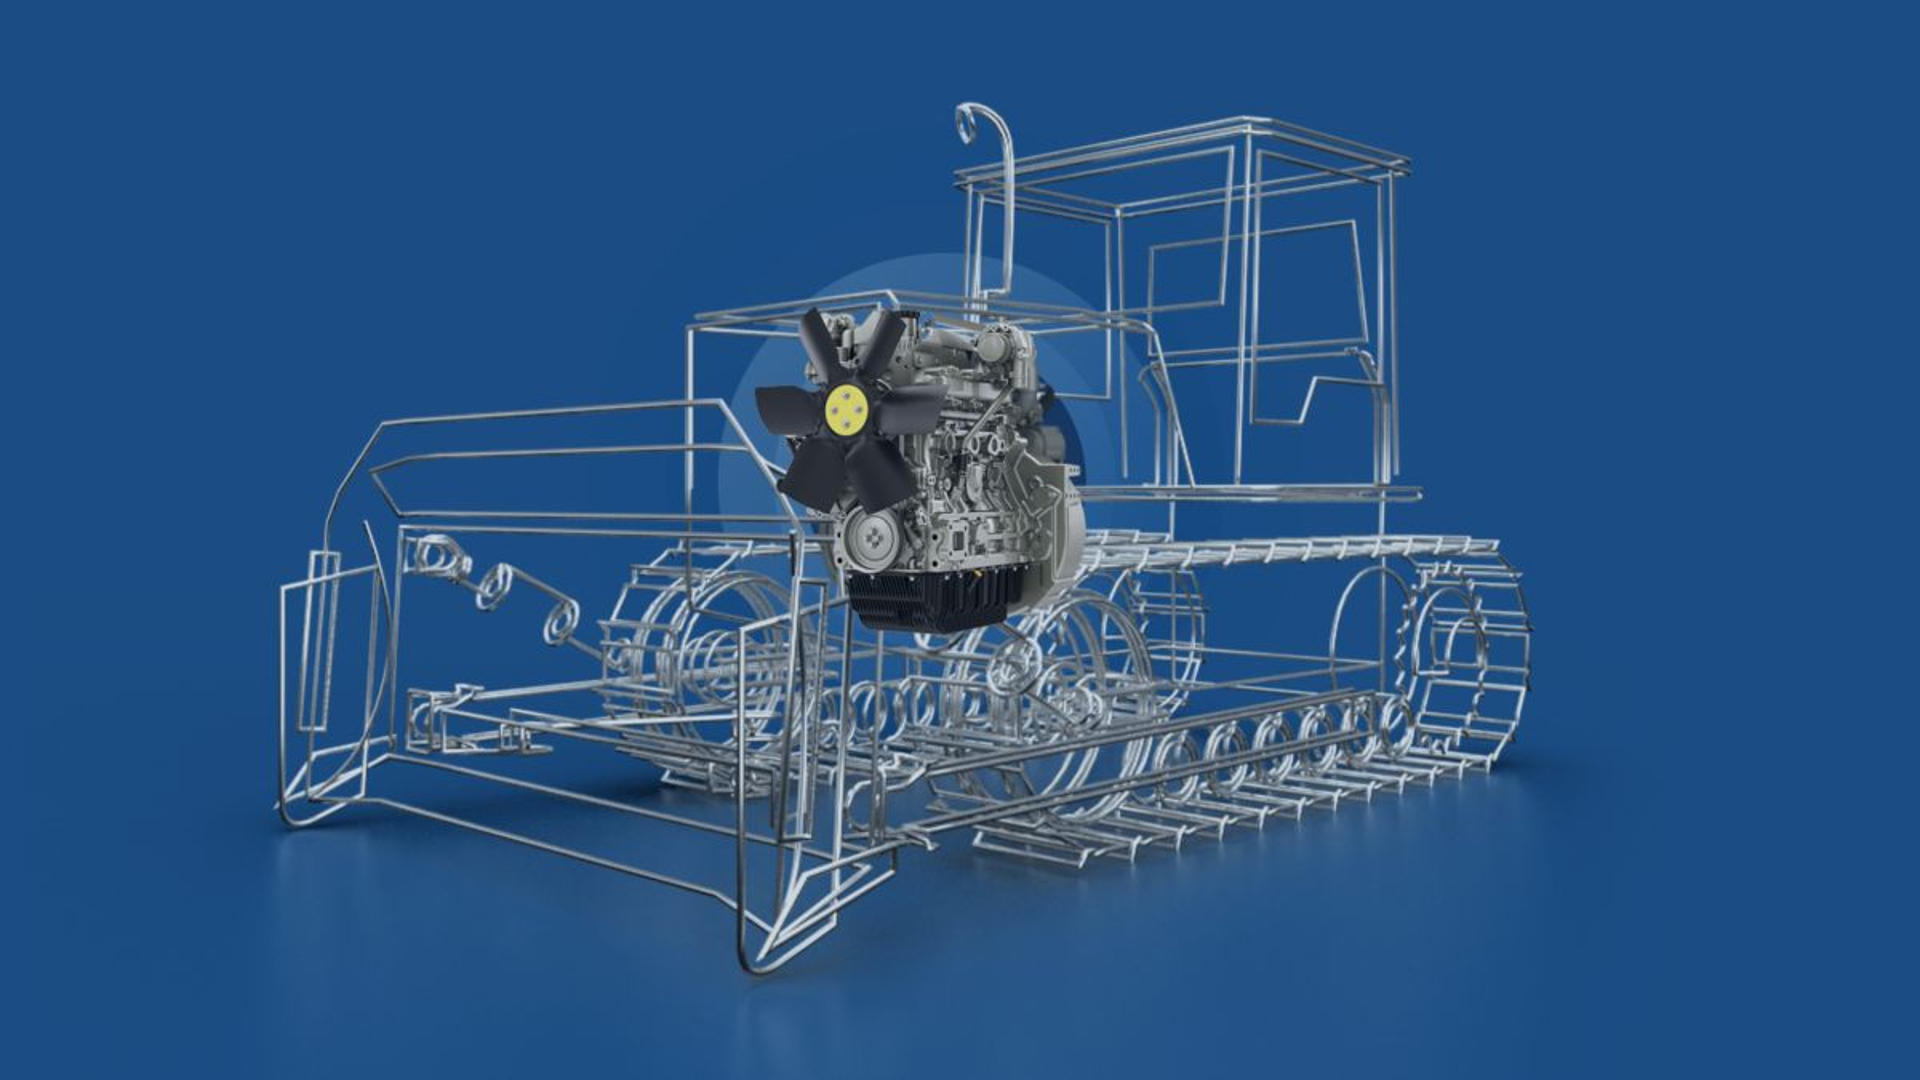 <b>Compact Power Reimagined</b>